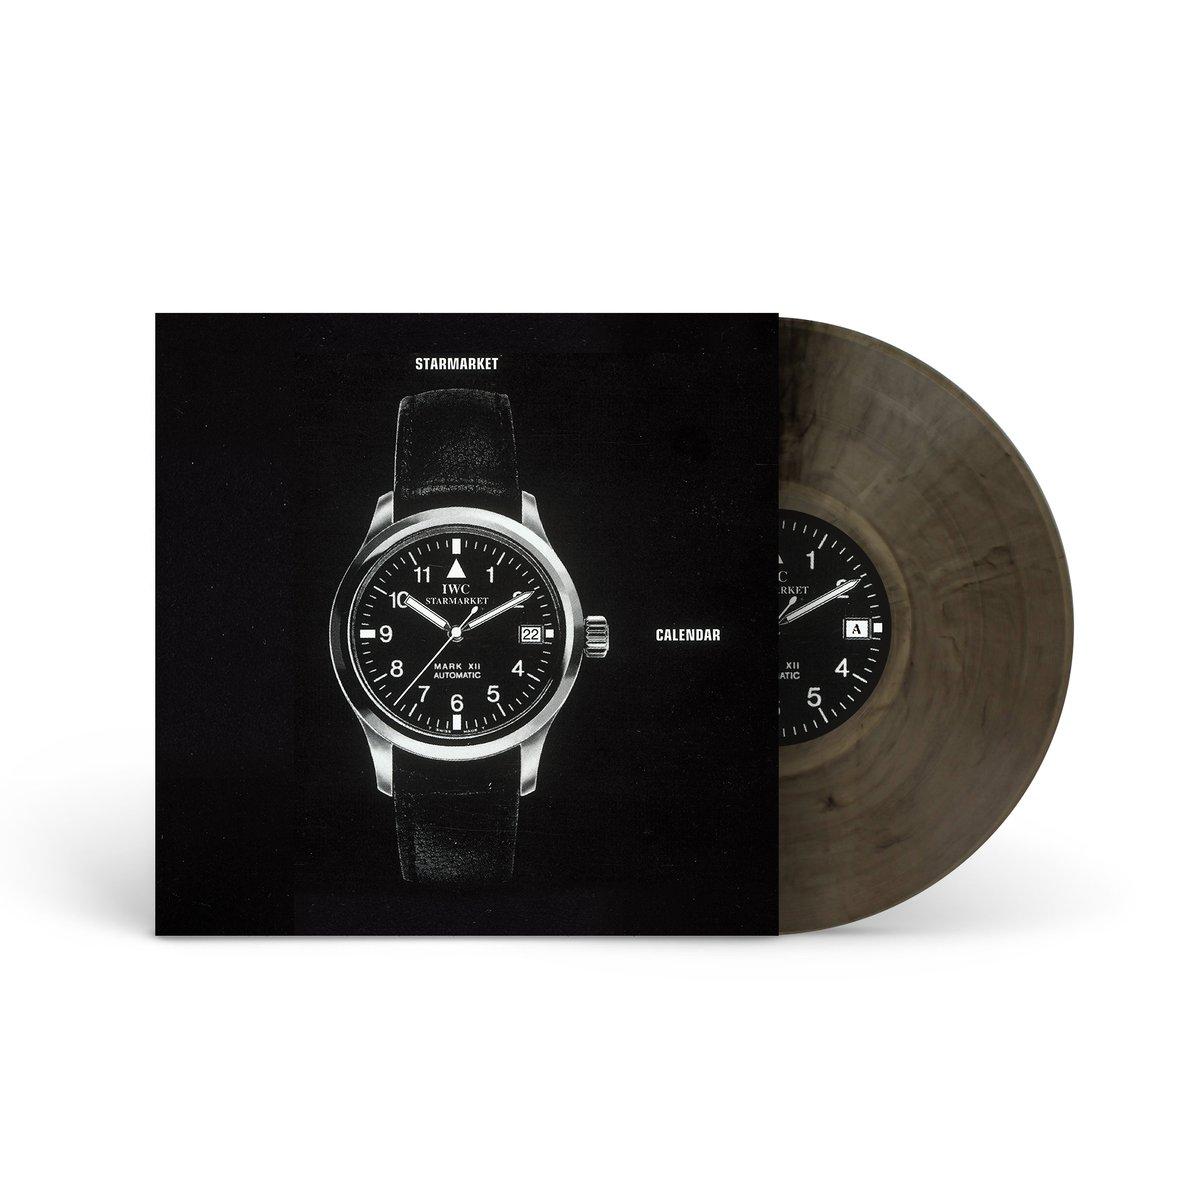 Image of Starmarket - Calendar LP